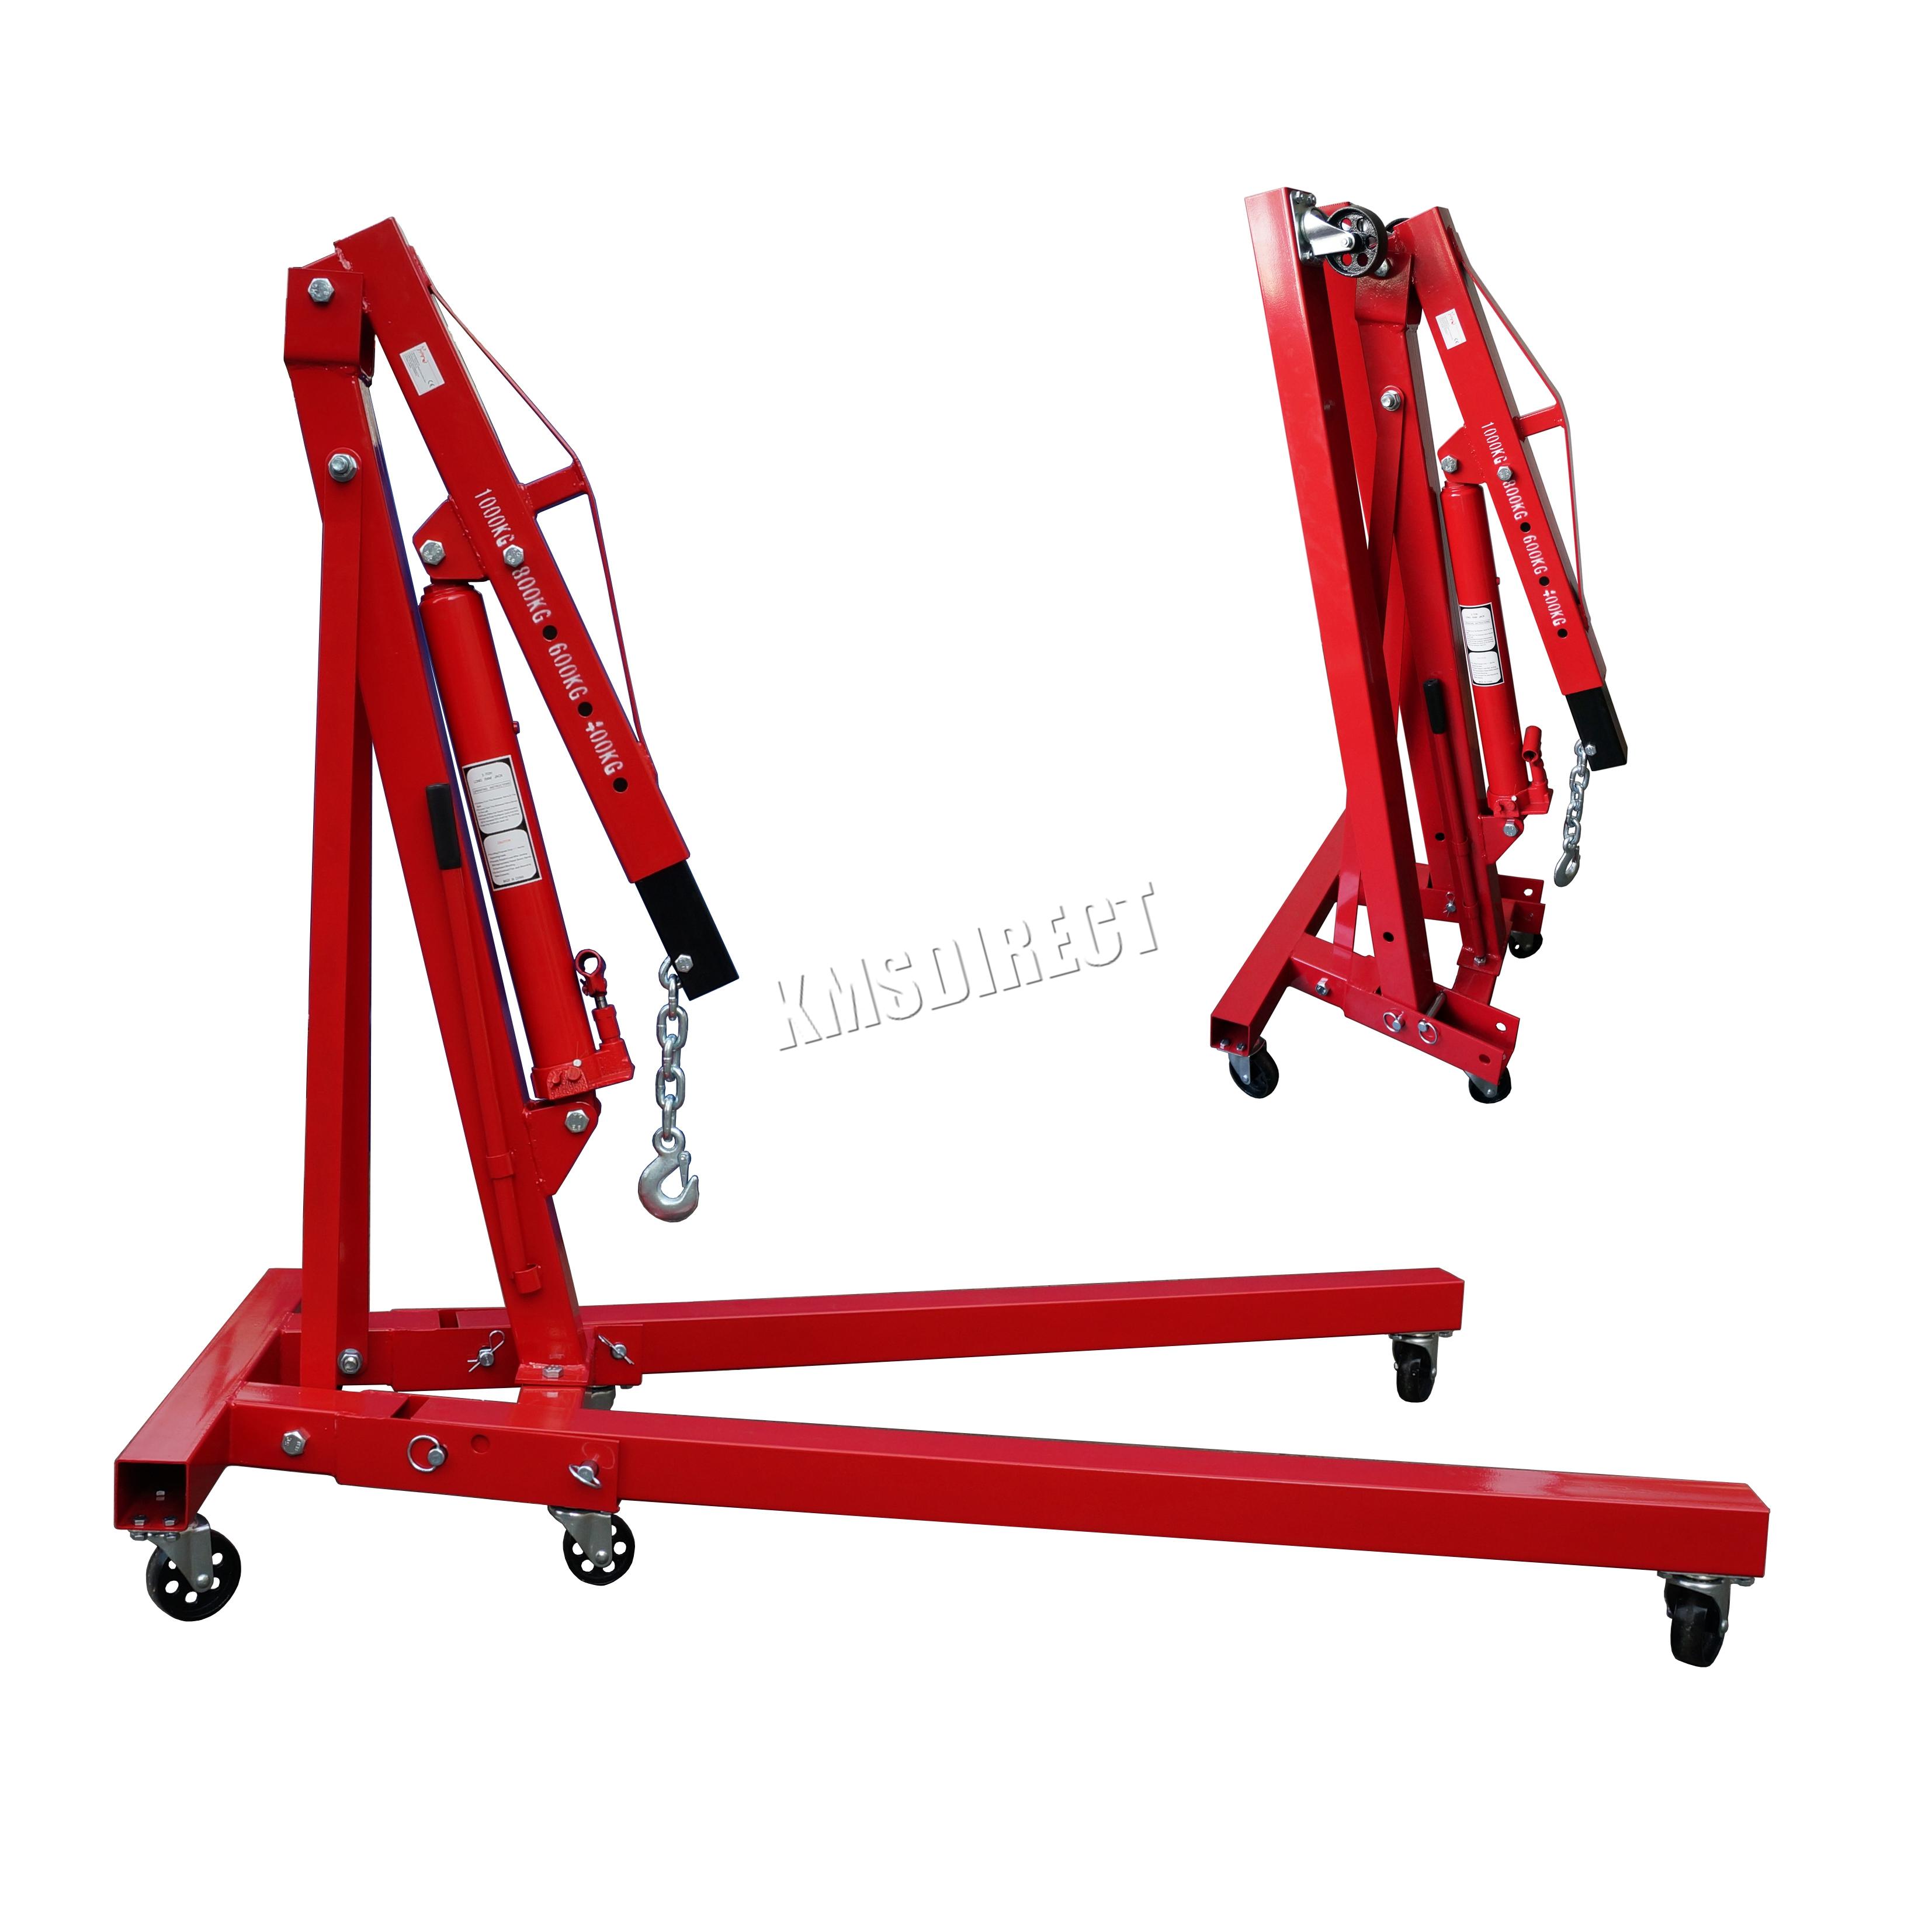 Folding Jack Stands >> FoxHunter Red 1 Ton Hydraulic Folding Engine Crane Shop Stand Hoist lift Jack | eBay